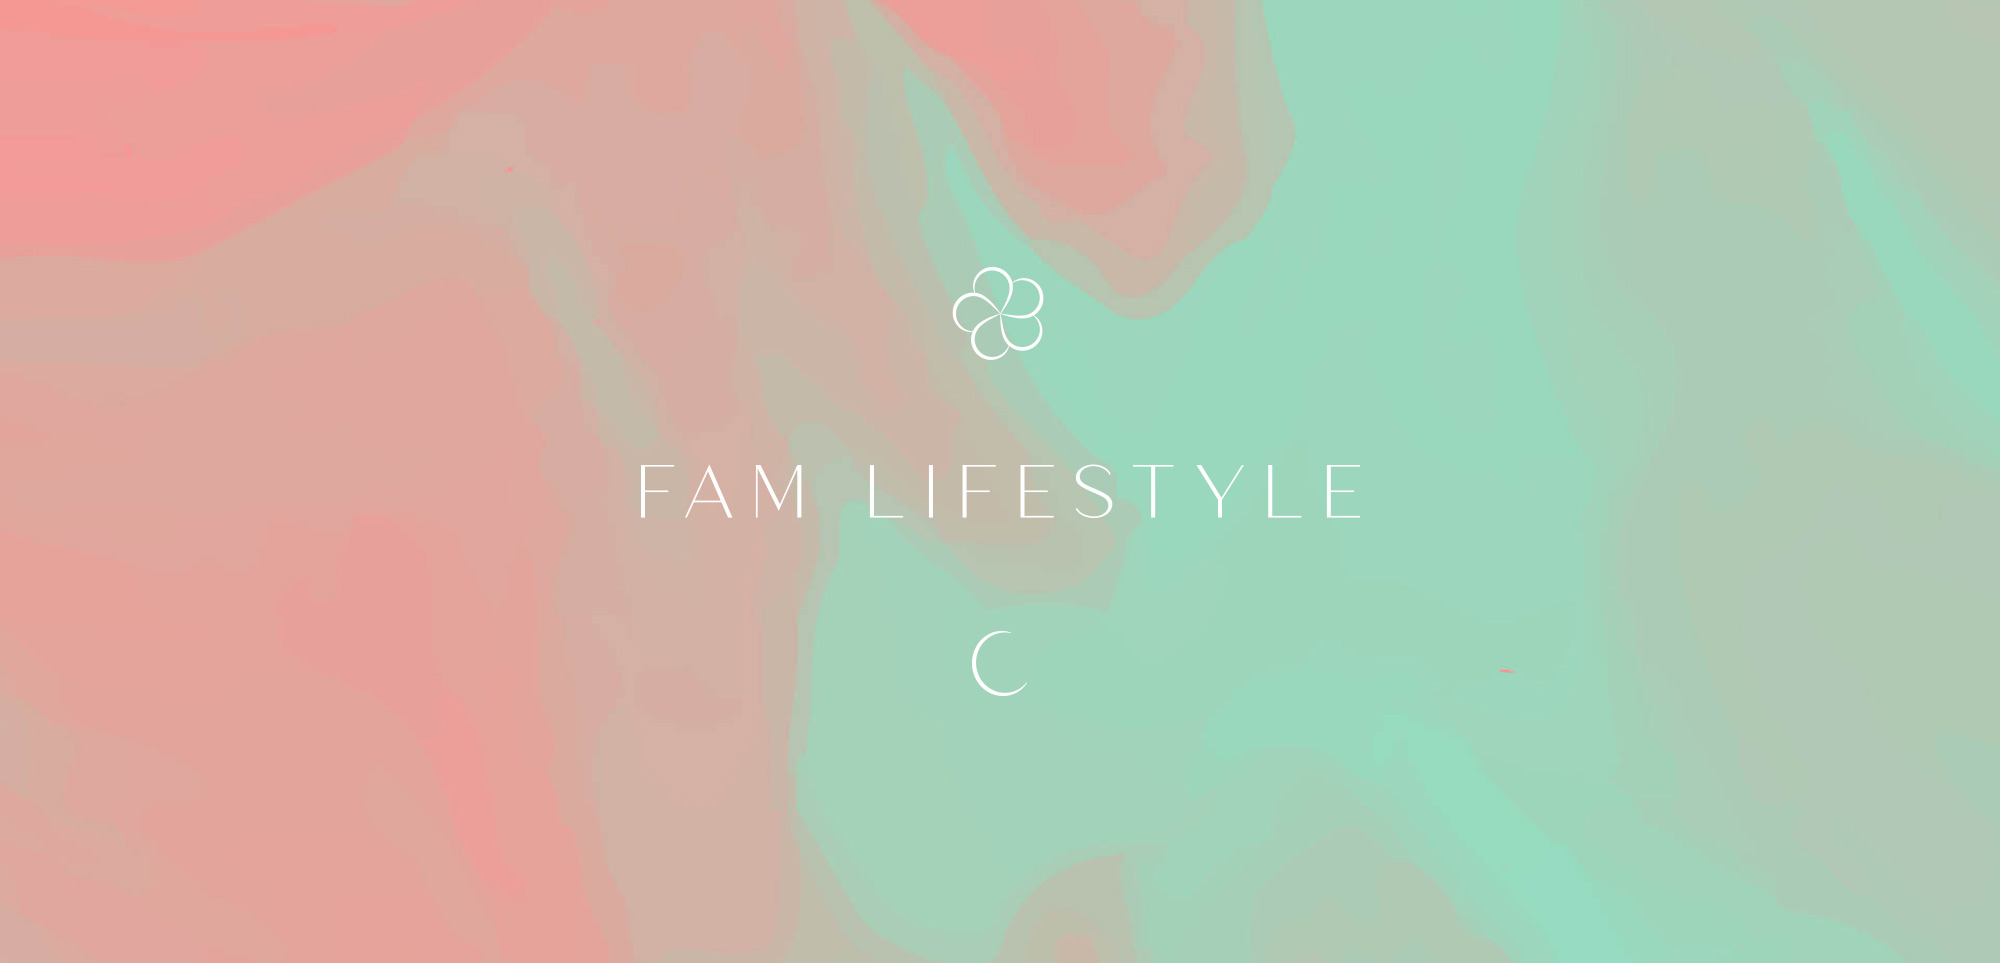 Fam_lifestyle2.jpg